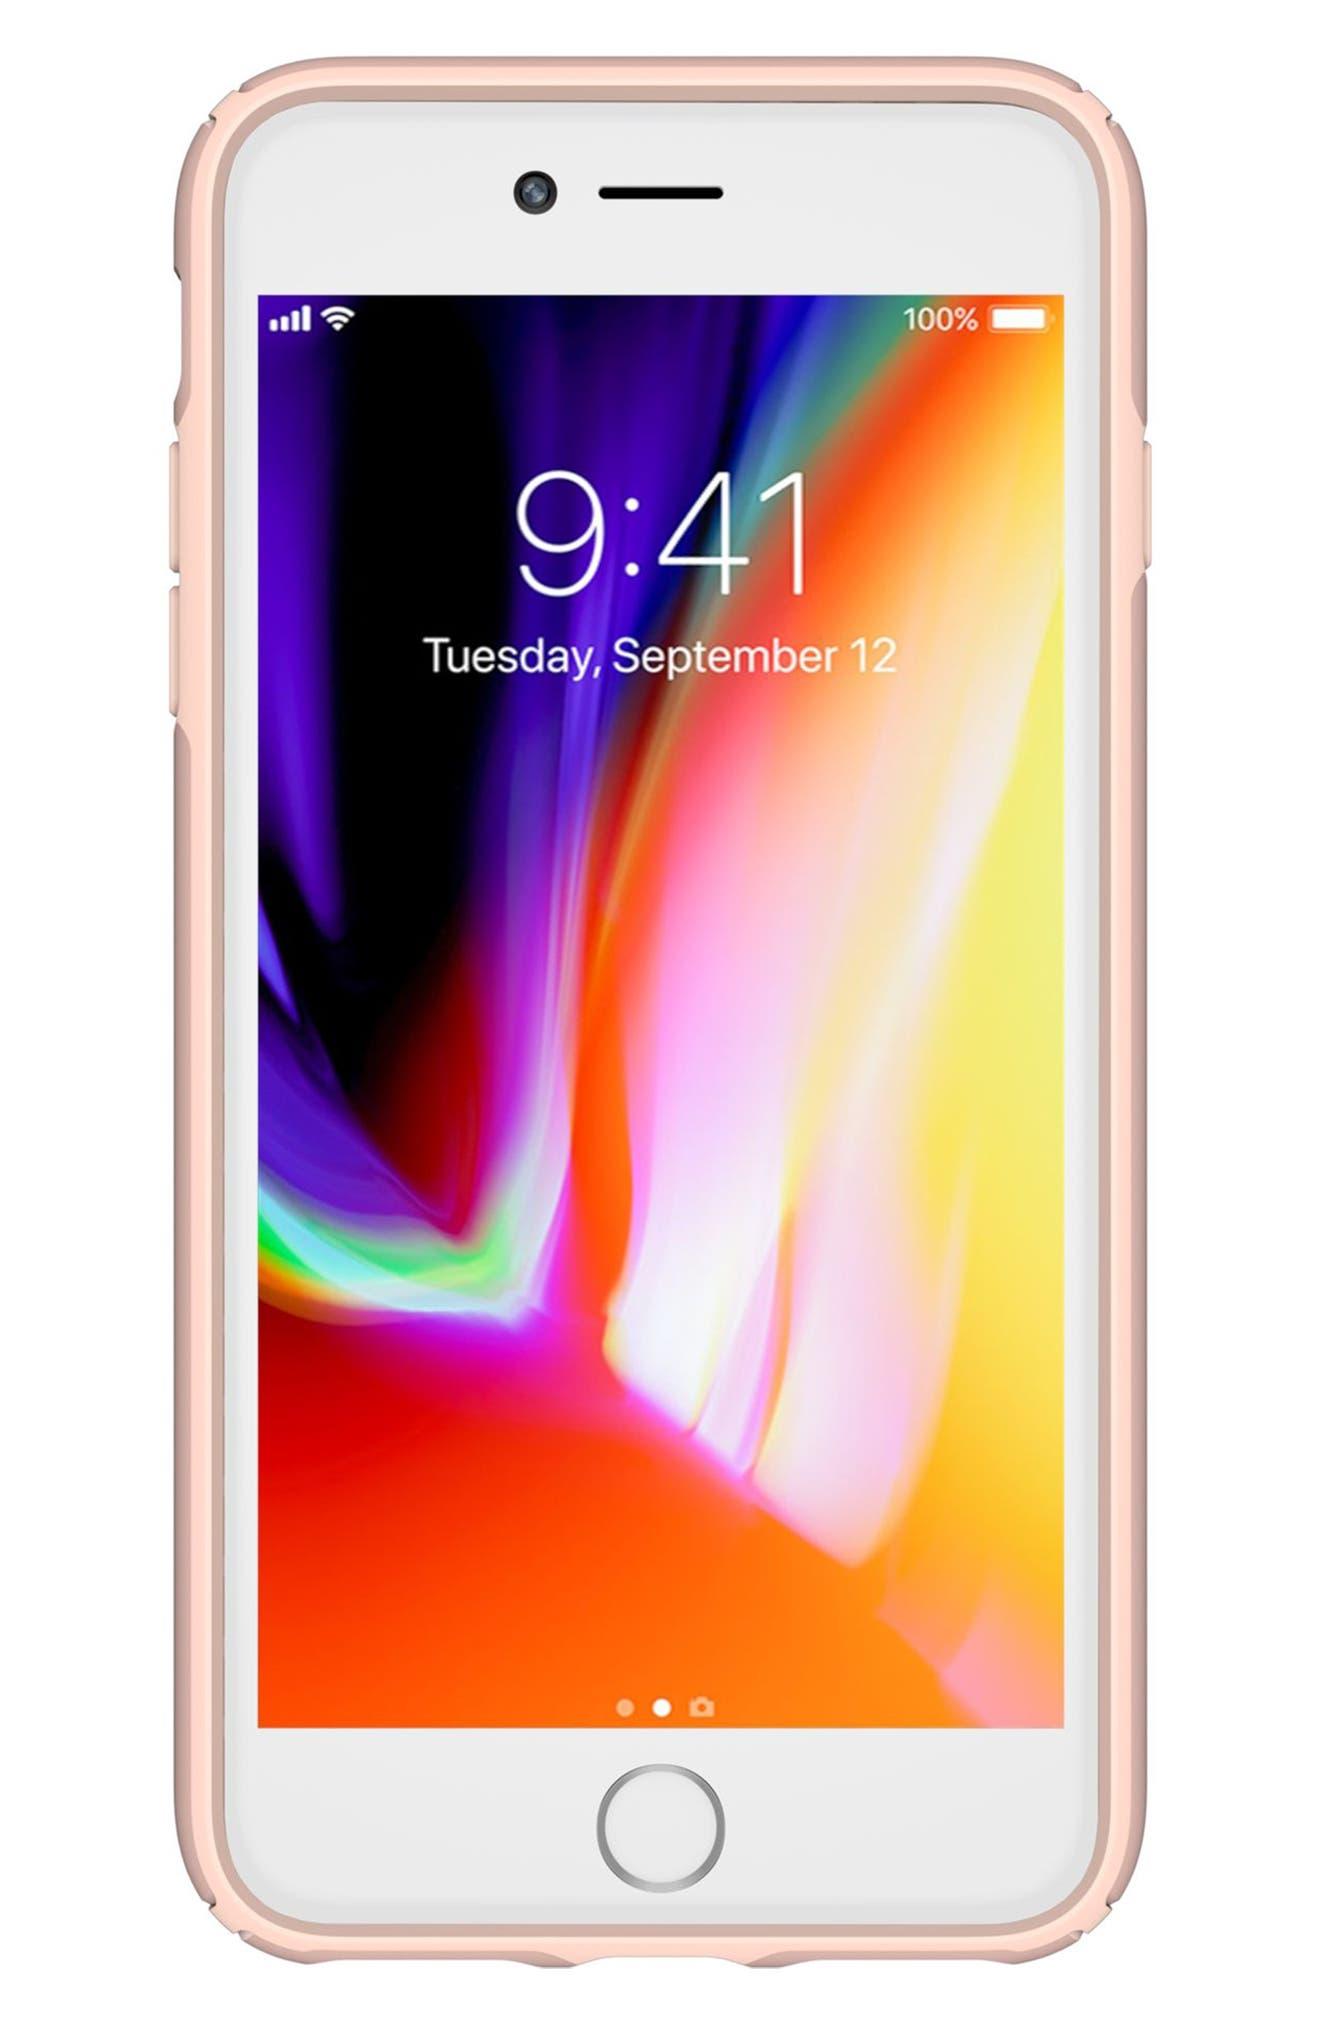 iPhone 6/6s/7/8 Plus Case,                             Alternate thumbnail 2, color,                             Rose Gold Metallic/ Peach